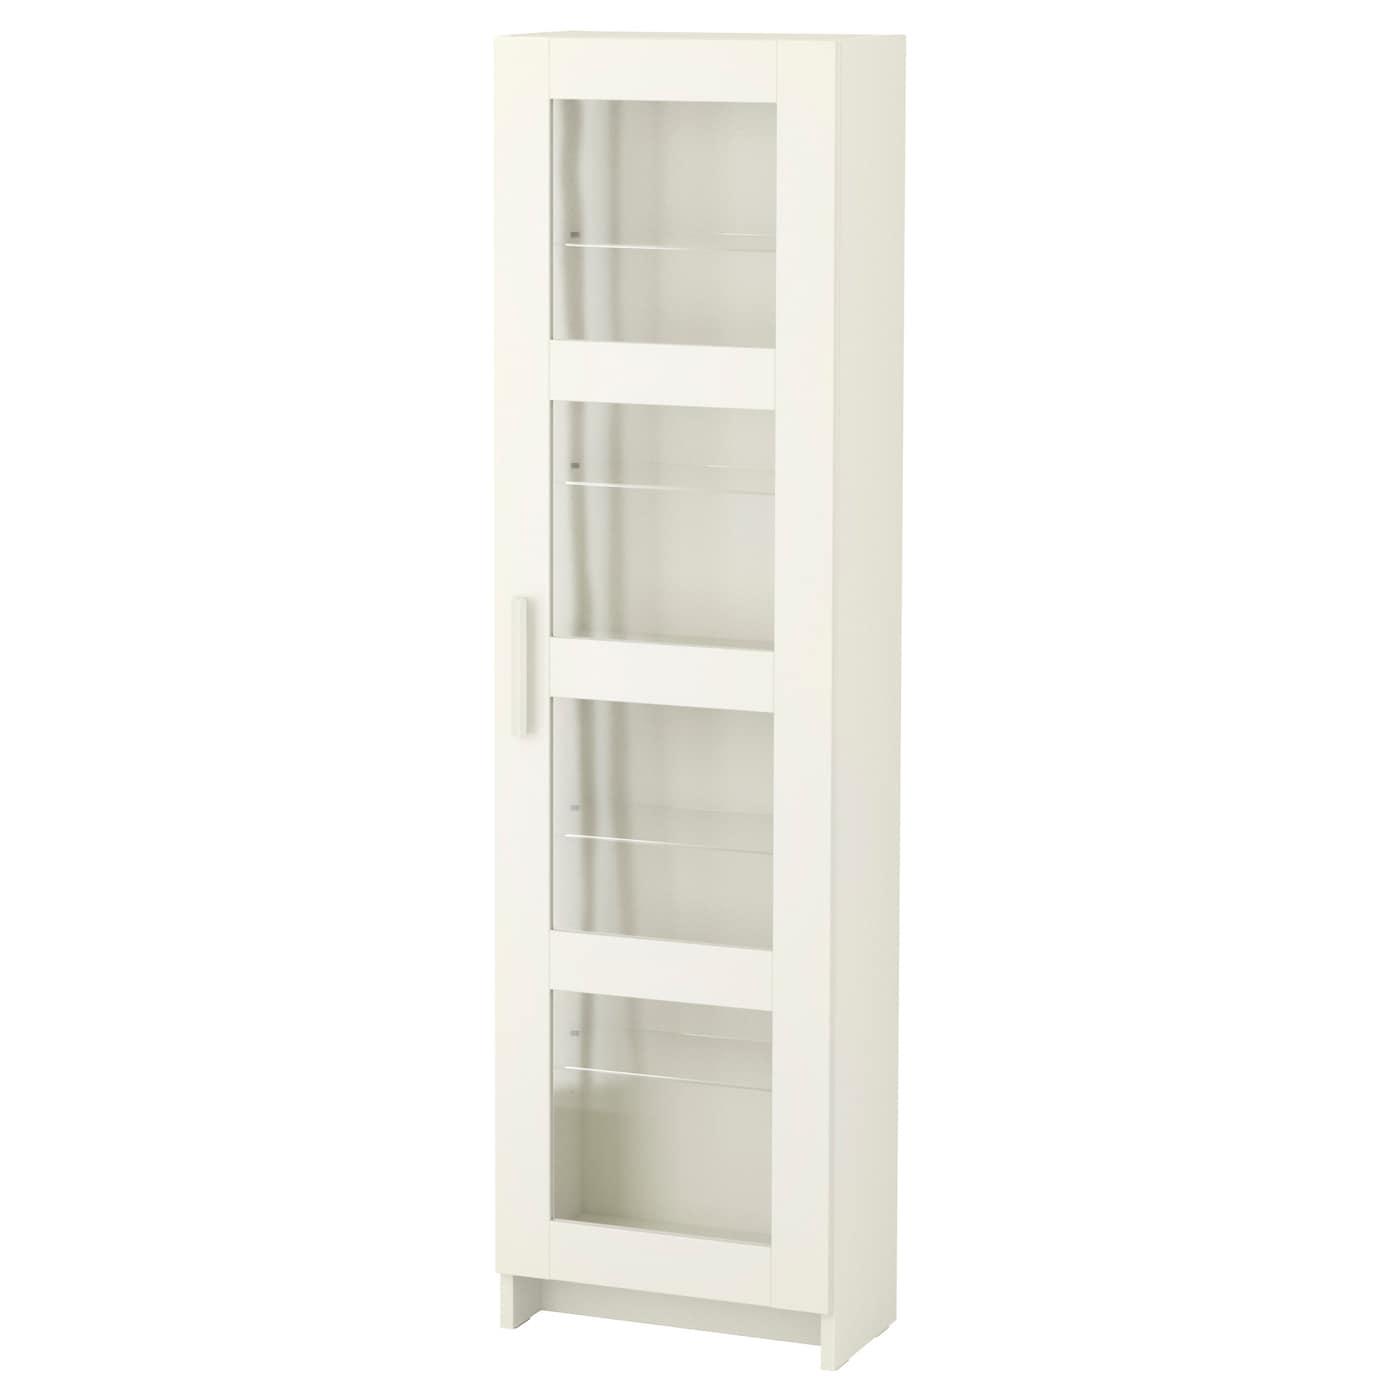 brimnes glass door cabinet white 39 x 142 cm ikea. Black Bedroom Furniture Sets. Home Design Ideas